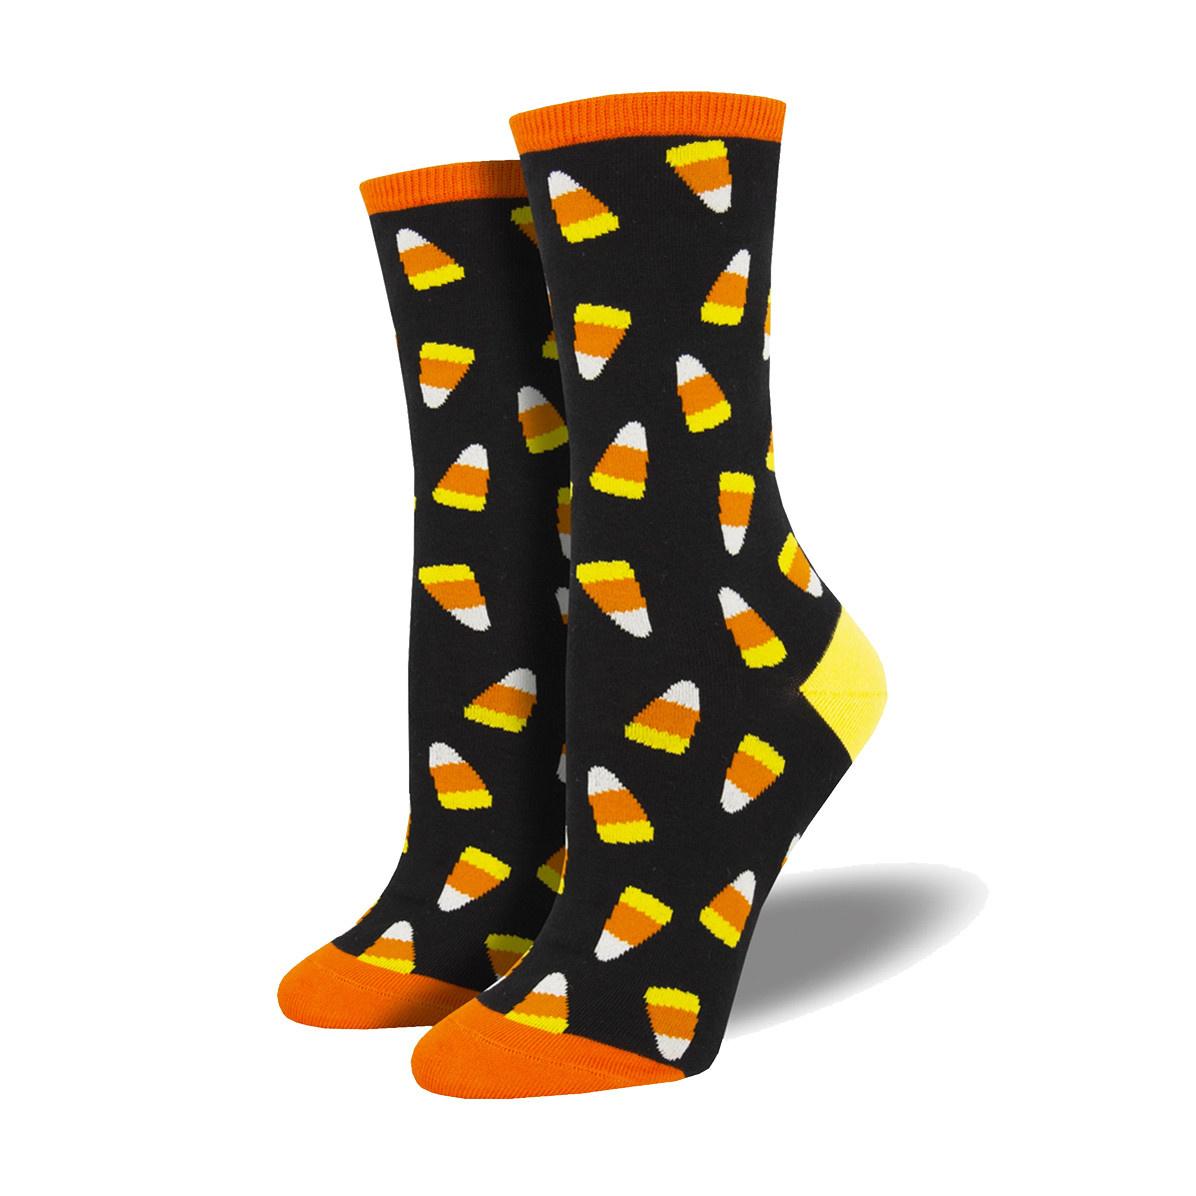 Socksmith Socksmith Women's Cotton Blend Socks Candy Corn